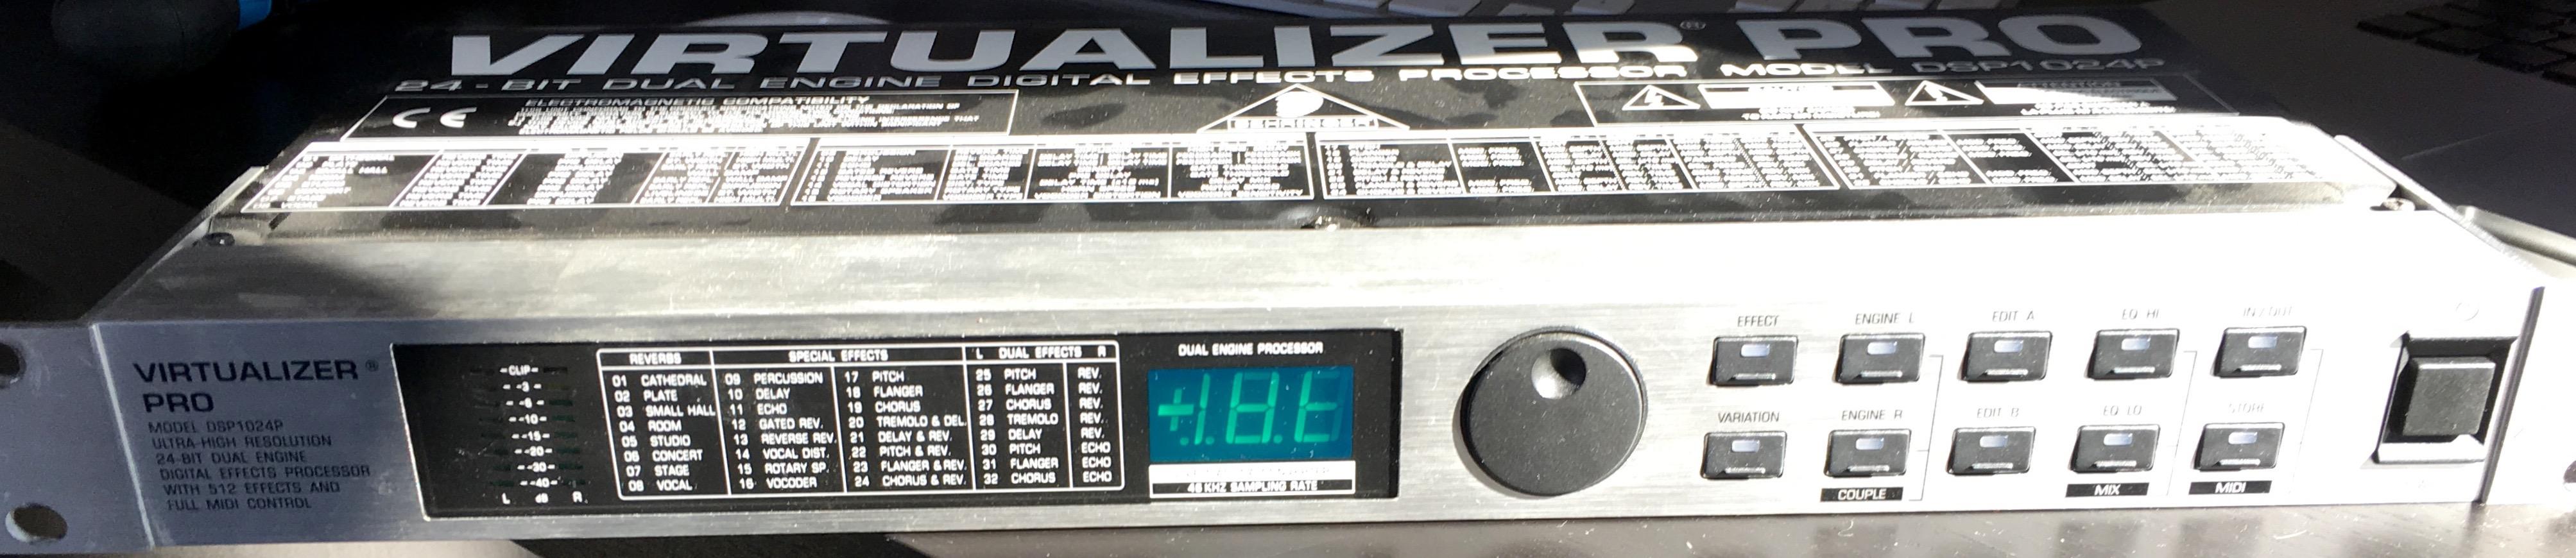 behringer virtualizer pro dsp2024p manual